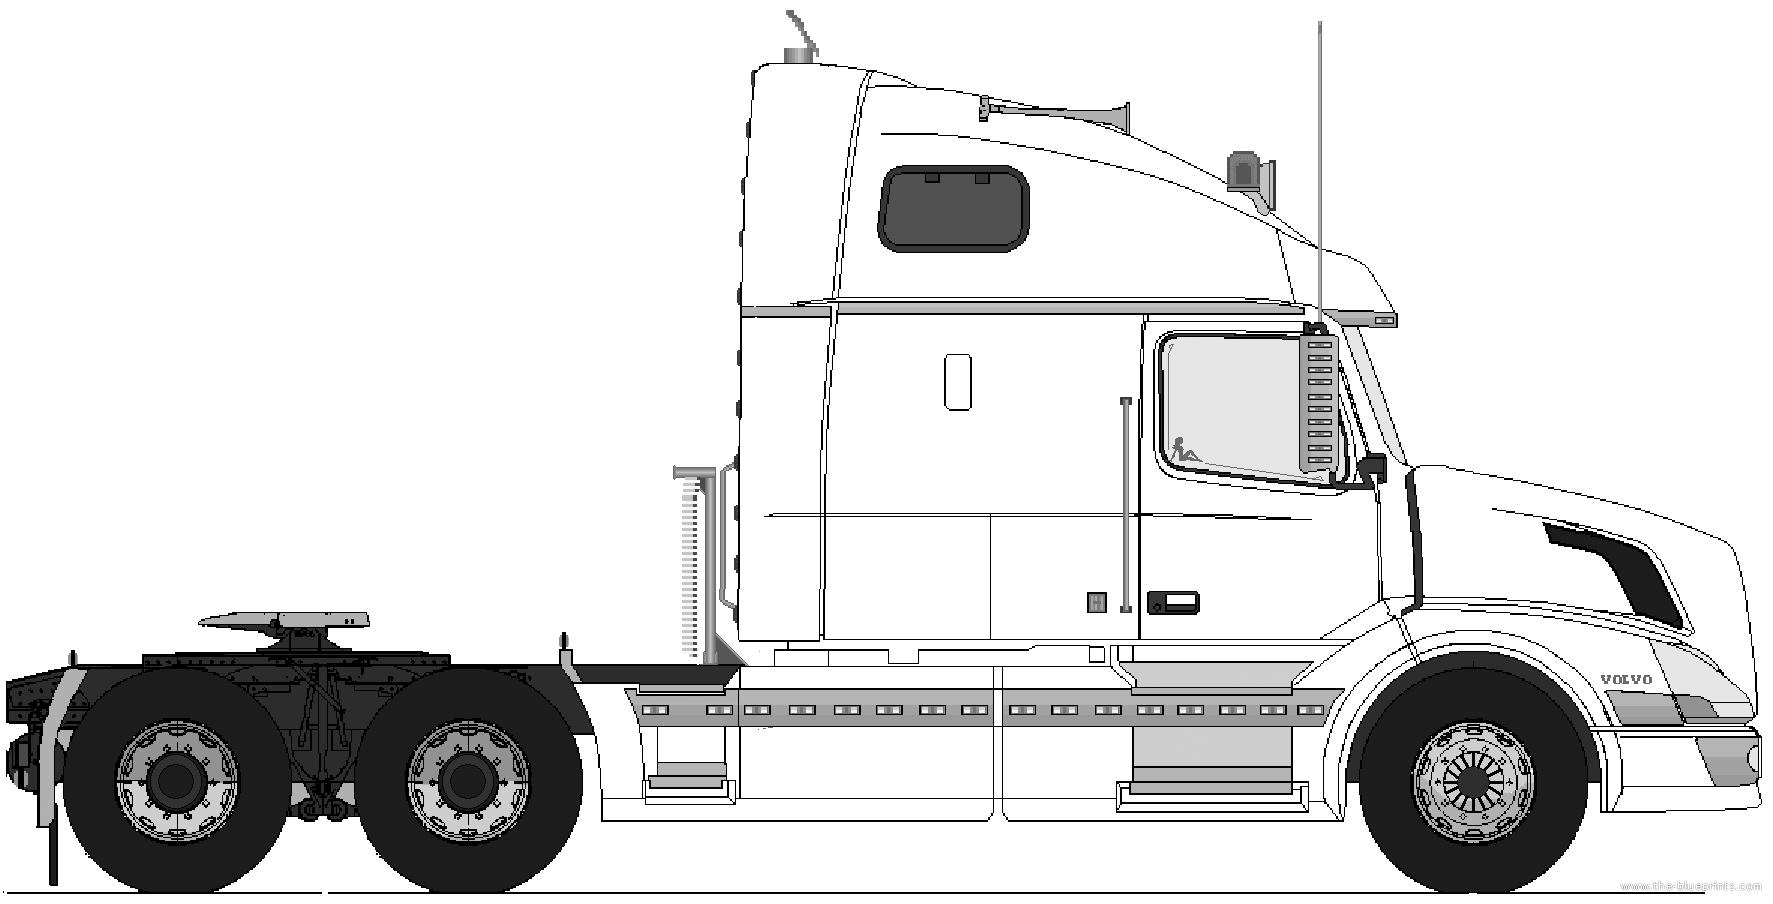 Blueprints Gt Trucks Gt Volvo Gt Volvo Vn 770 6x4 Tractor Unit